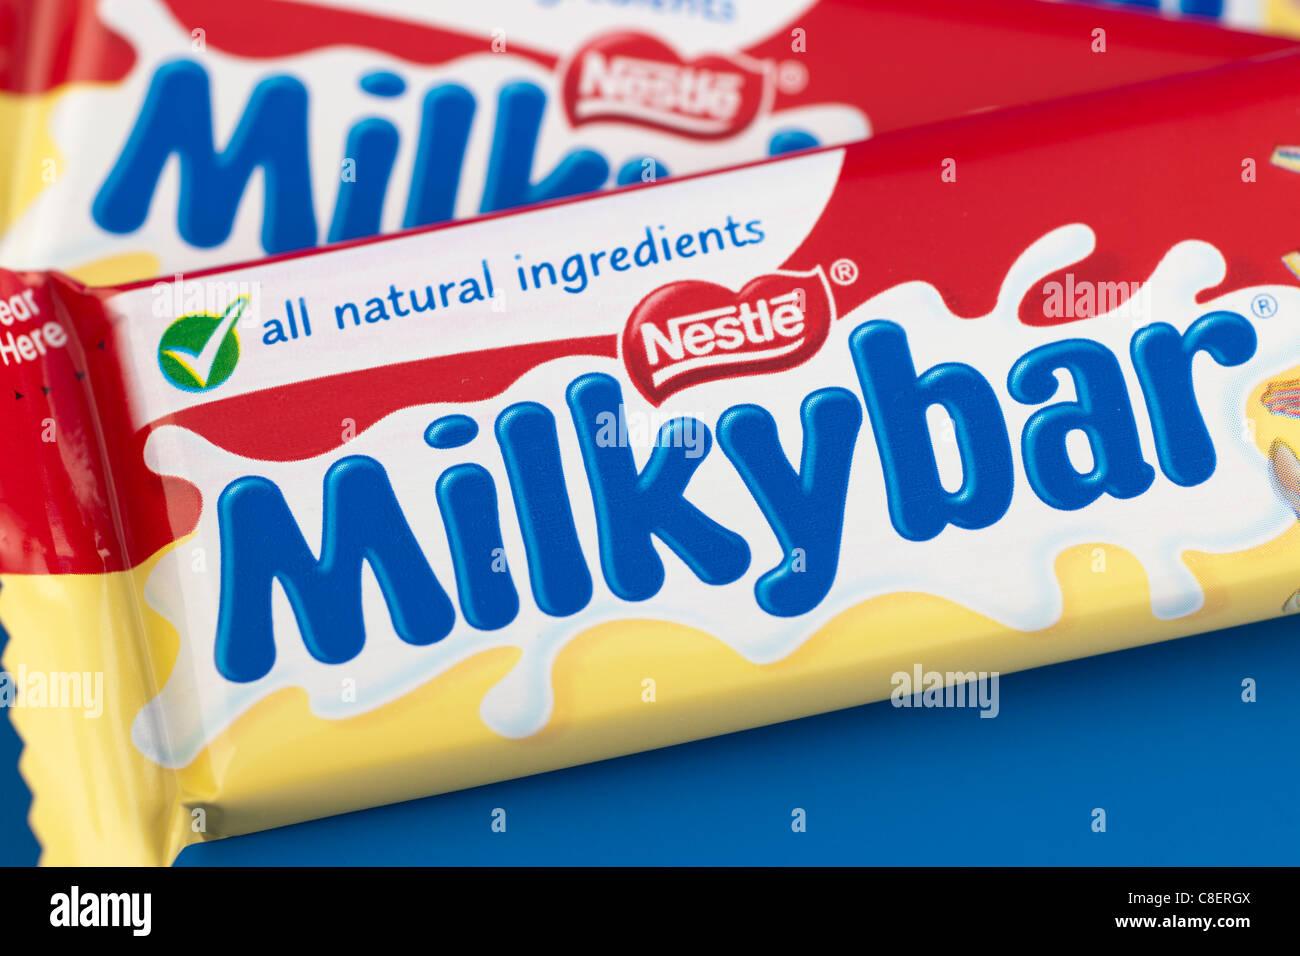 Nestle Milky Bar Chocolate Bar Stock Photos & Nestle Milky Bar ...